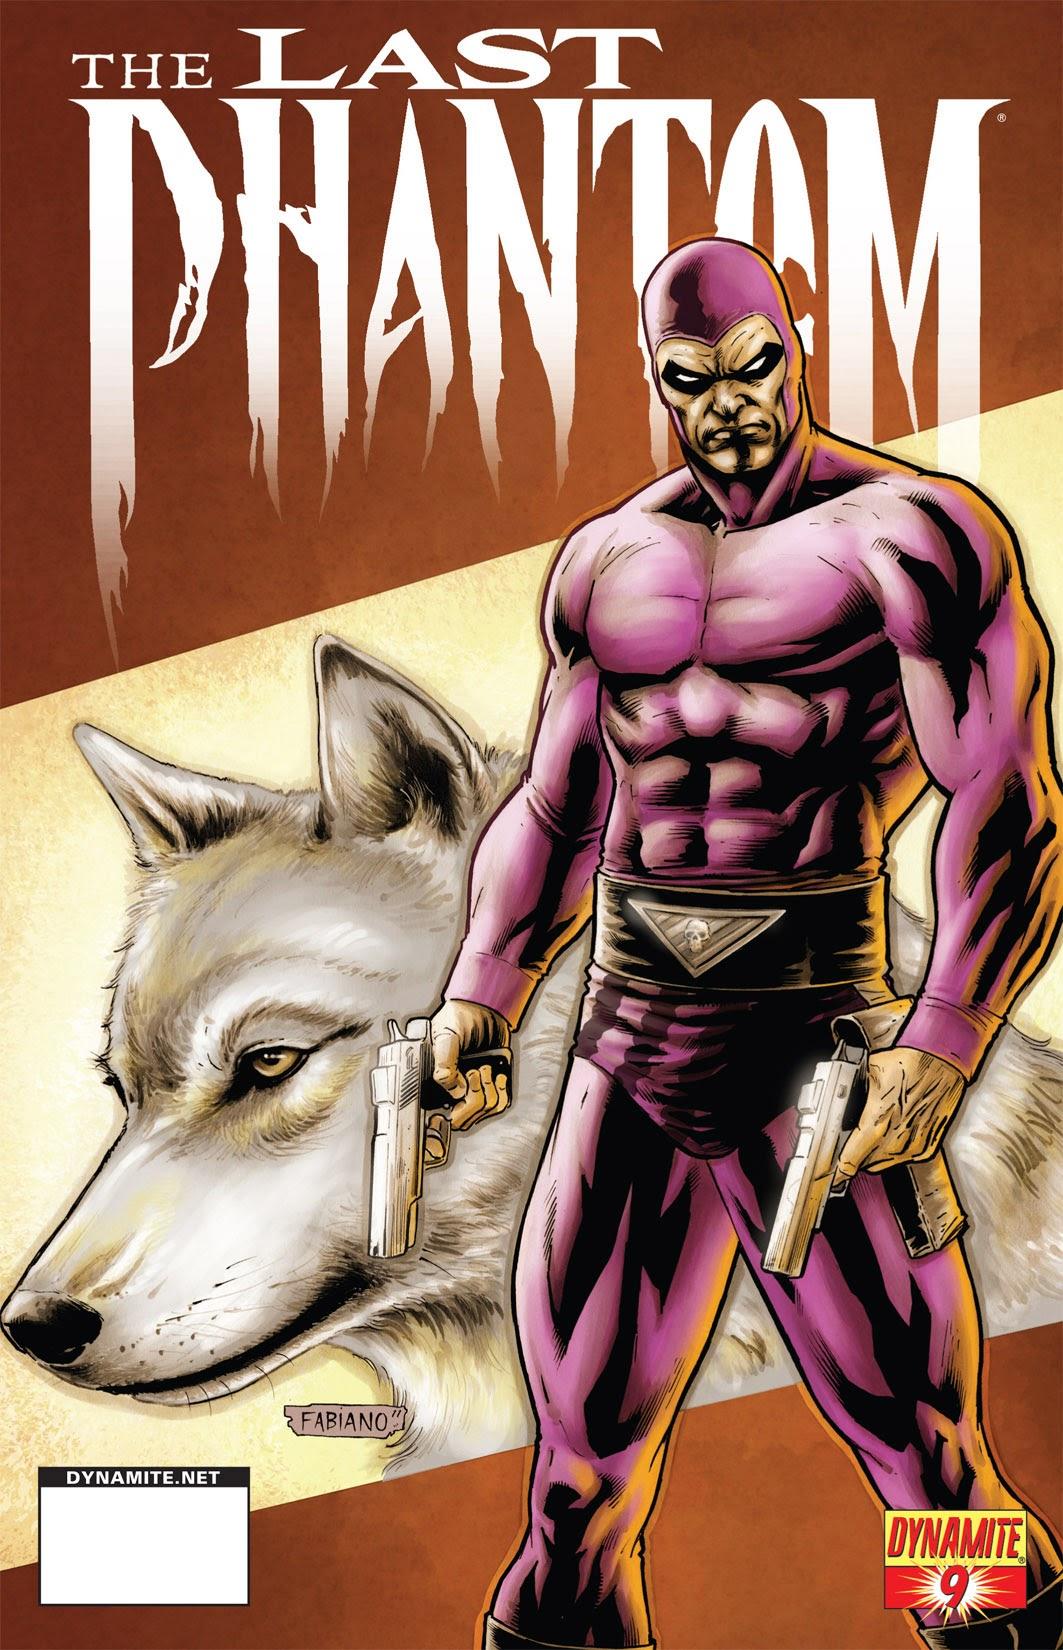 The Last Phantom 9 Page 1